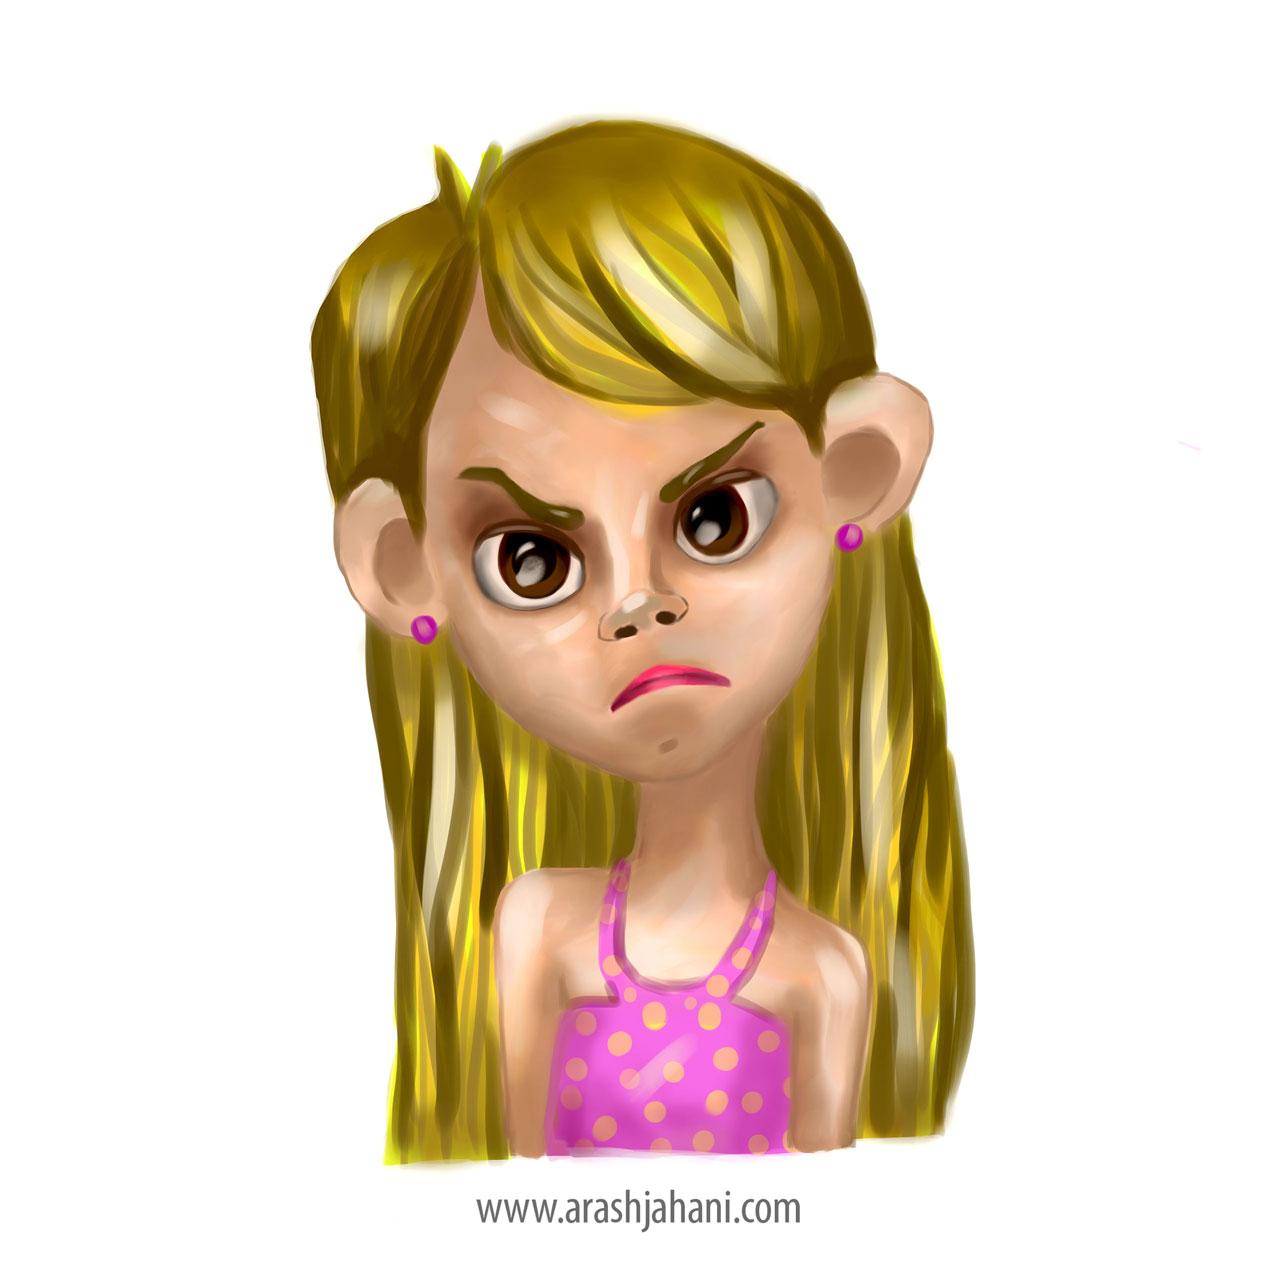 childrens book illustrator